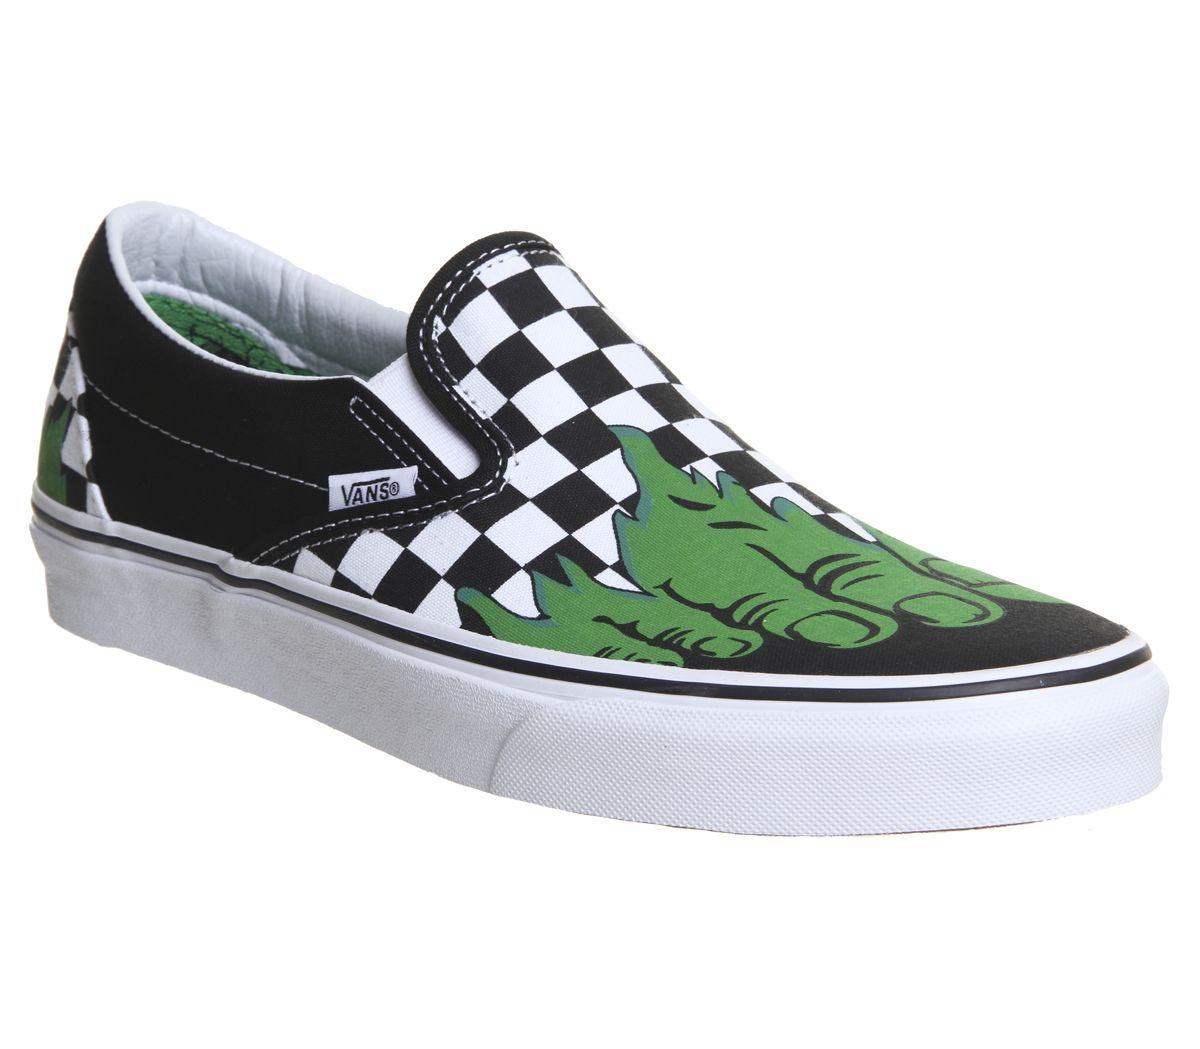 59e82db550 Vans Vans Classic Slip On Trainers Hulk Checkerboard Marvel - Unisex ...